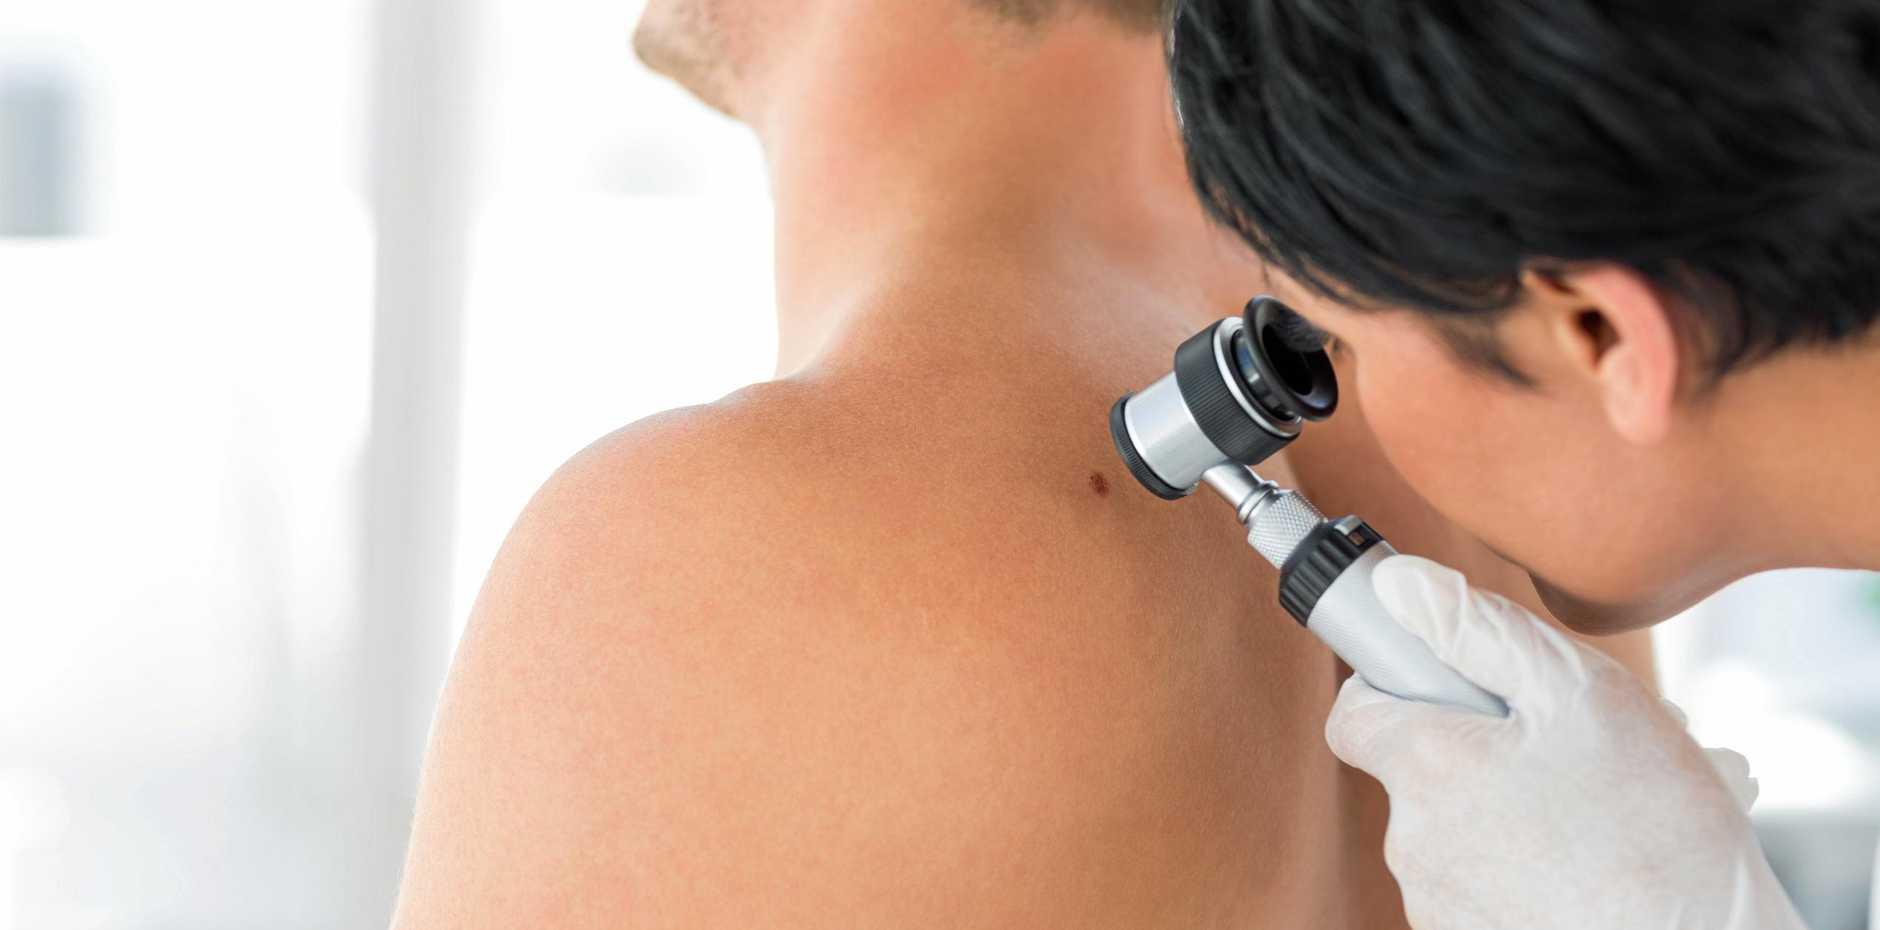 TAKE THE TIME: Regular skin checks are advisable.